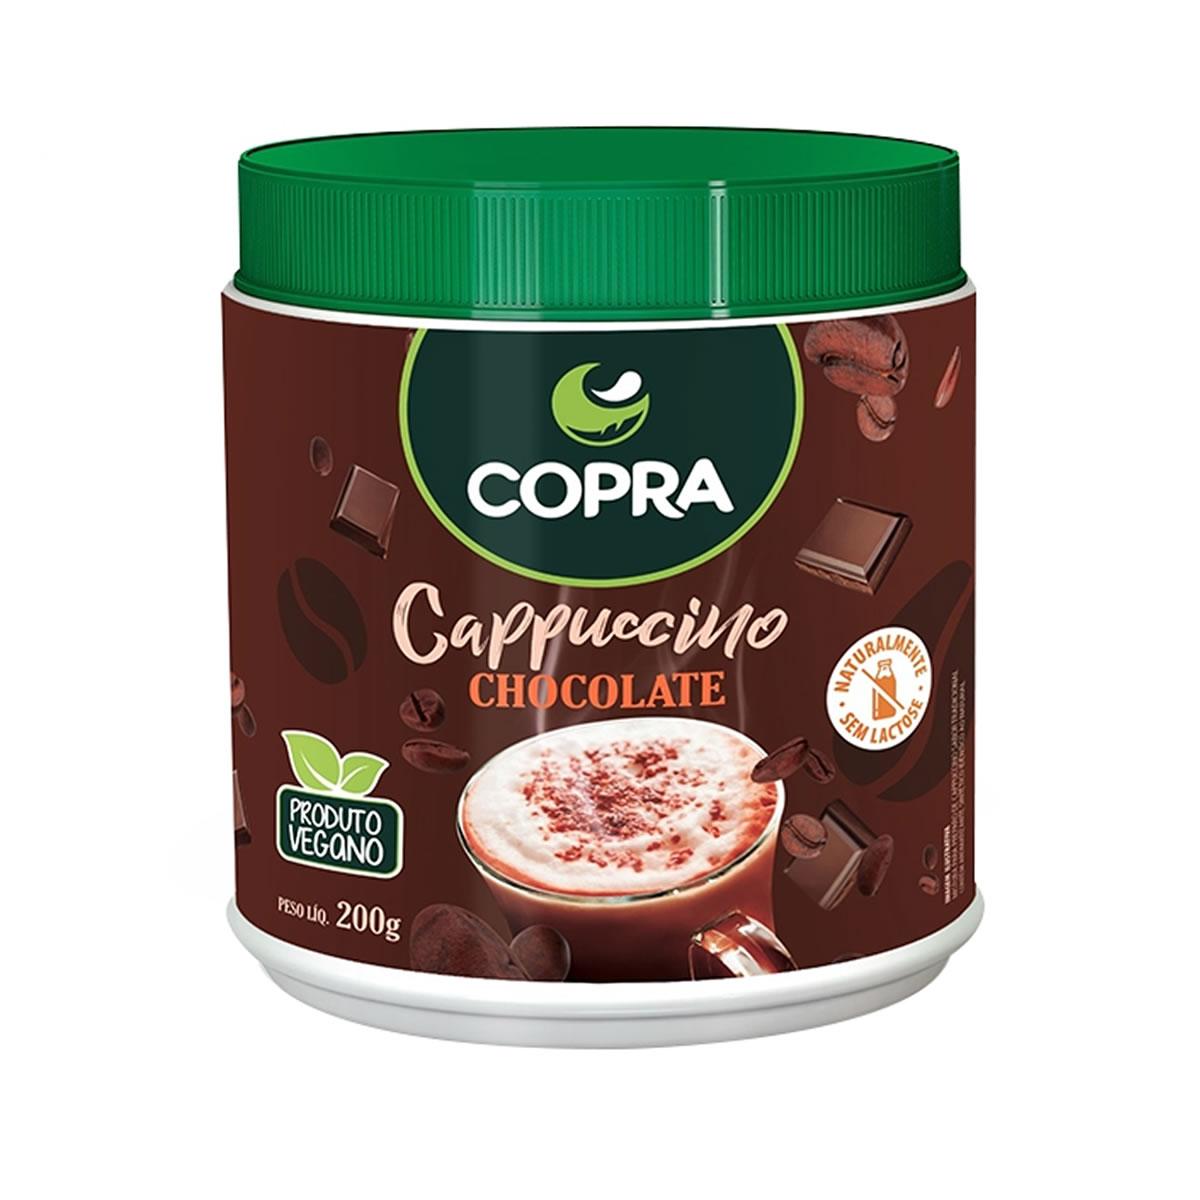 Cappuccino sabor Chocolate 200g - Copra